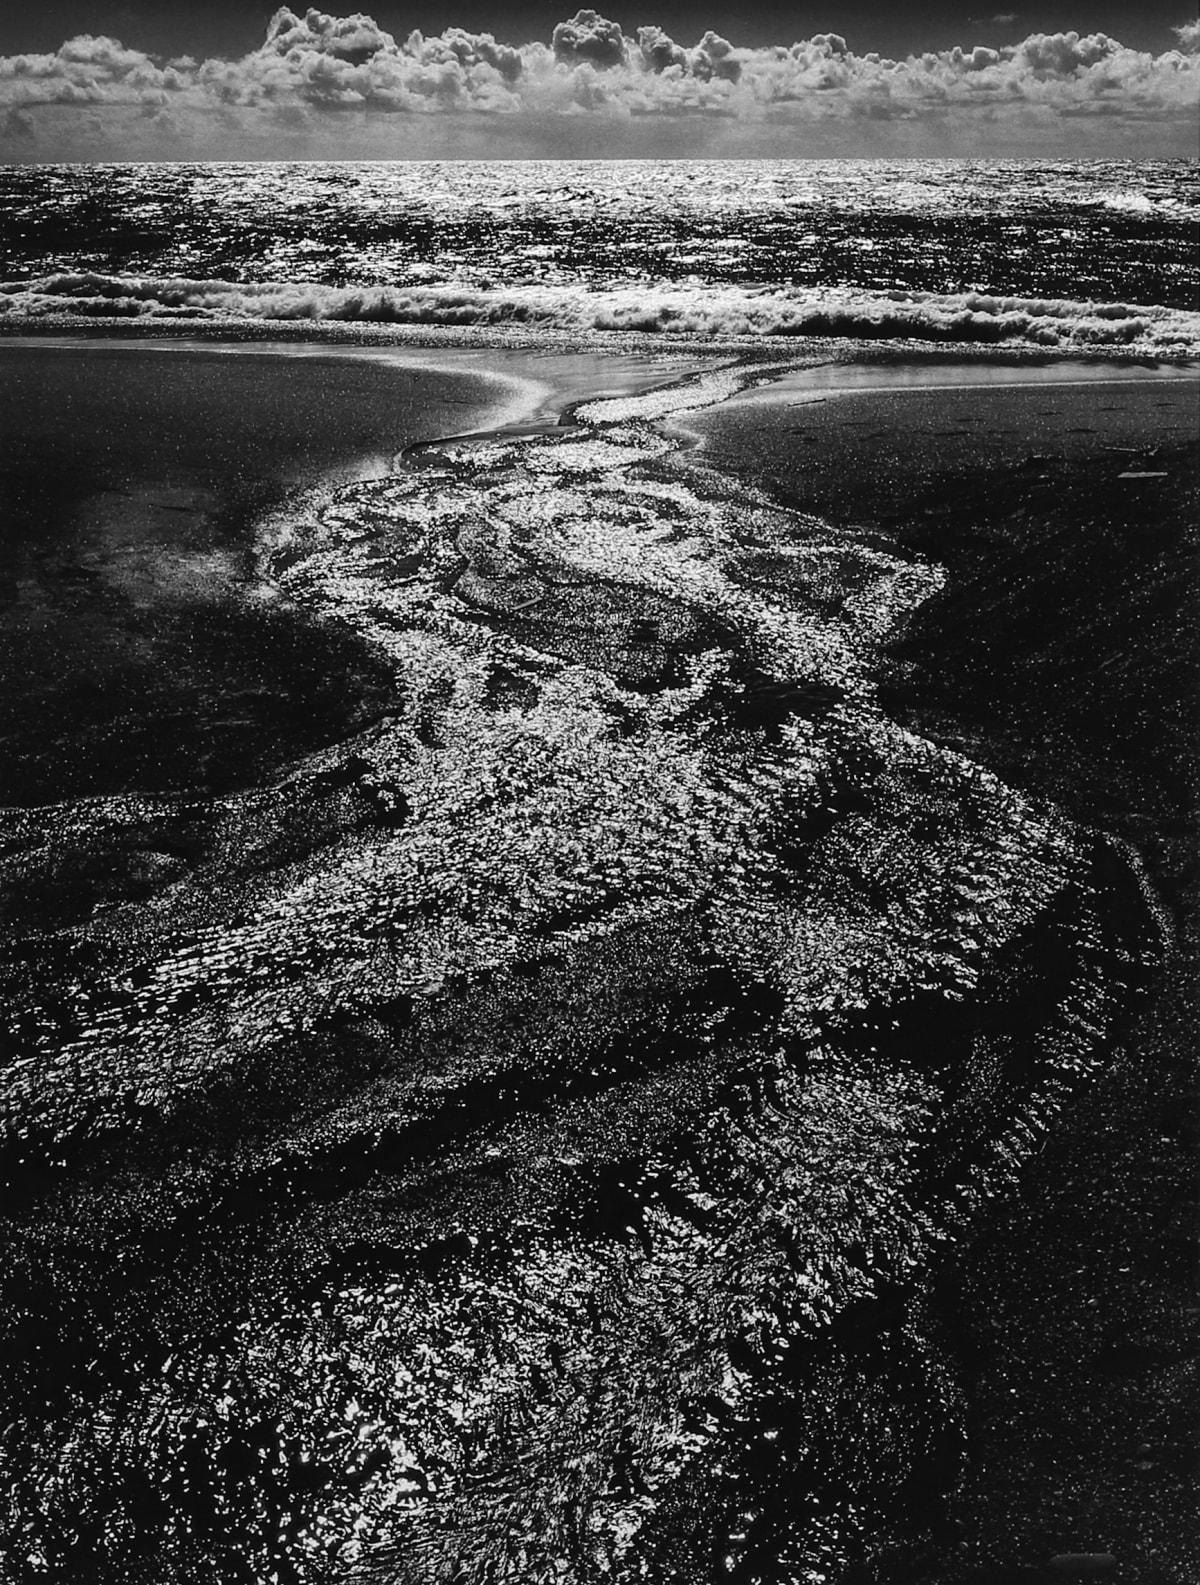 Ansel Adams, Stream, Sea, Clouds, Rodeo Lagoon, CA, 1962